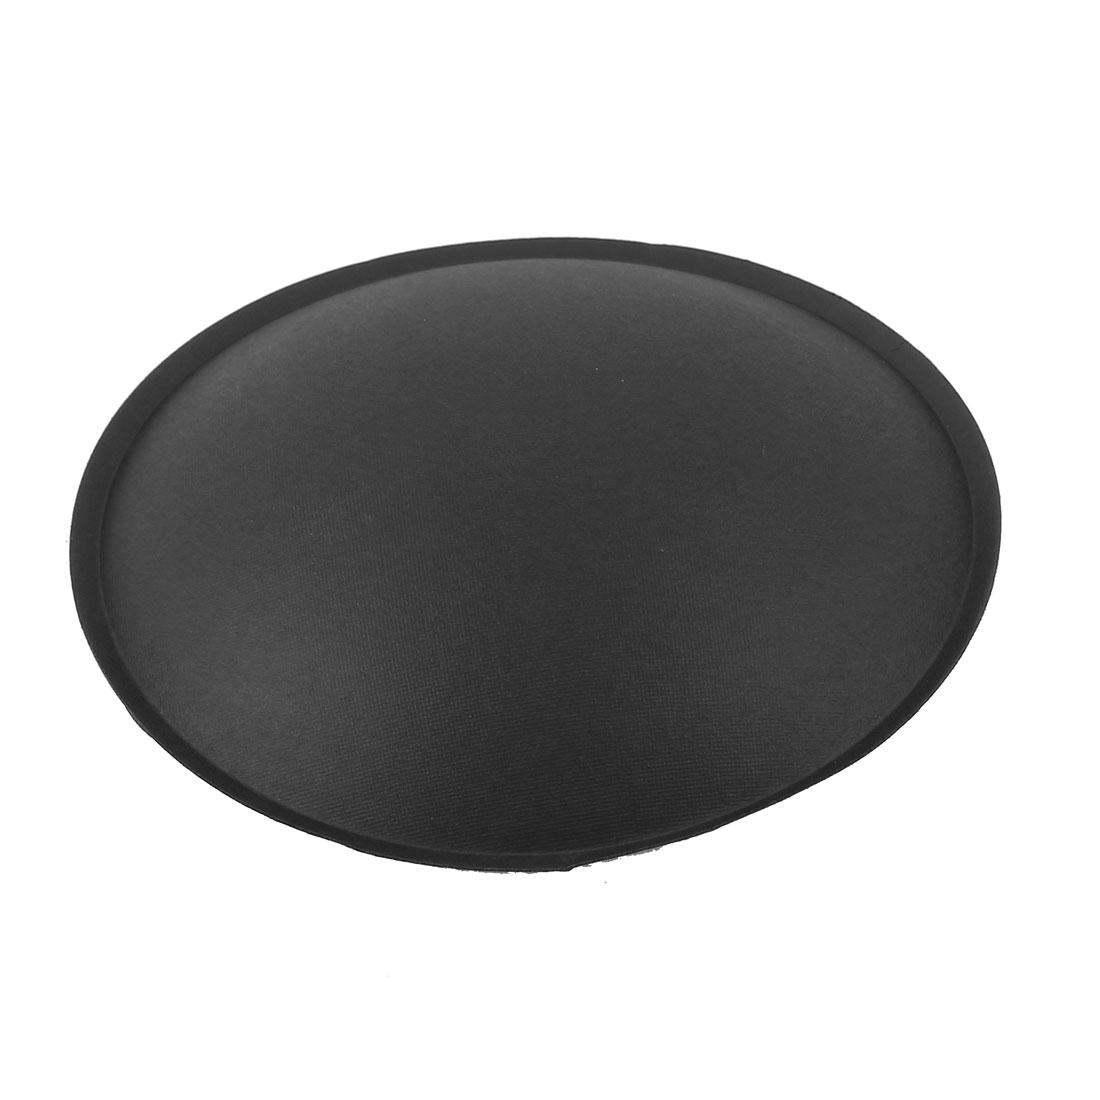 130mm Dia Dome Shape Audio Speaker Loudspeaker Subwoofer Dustproof Cover Cap